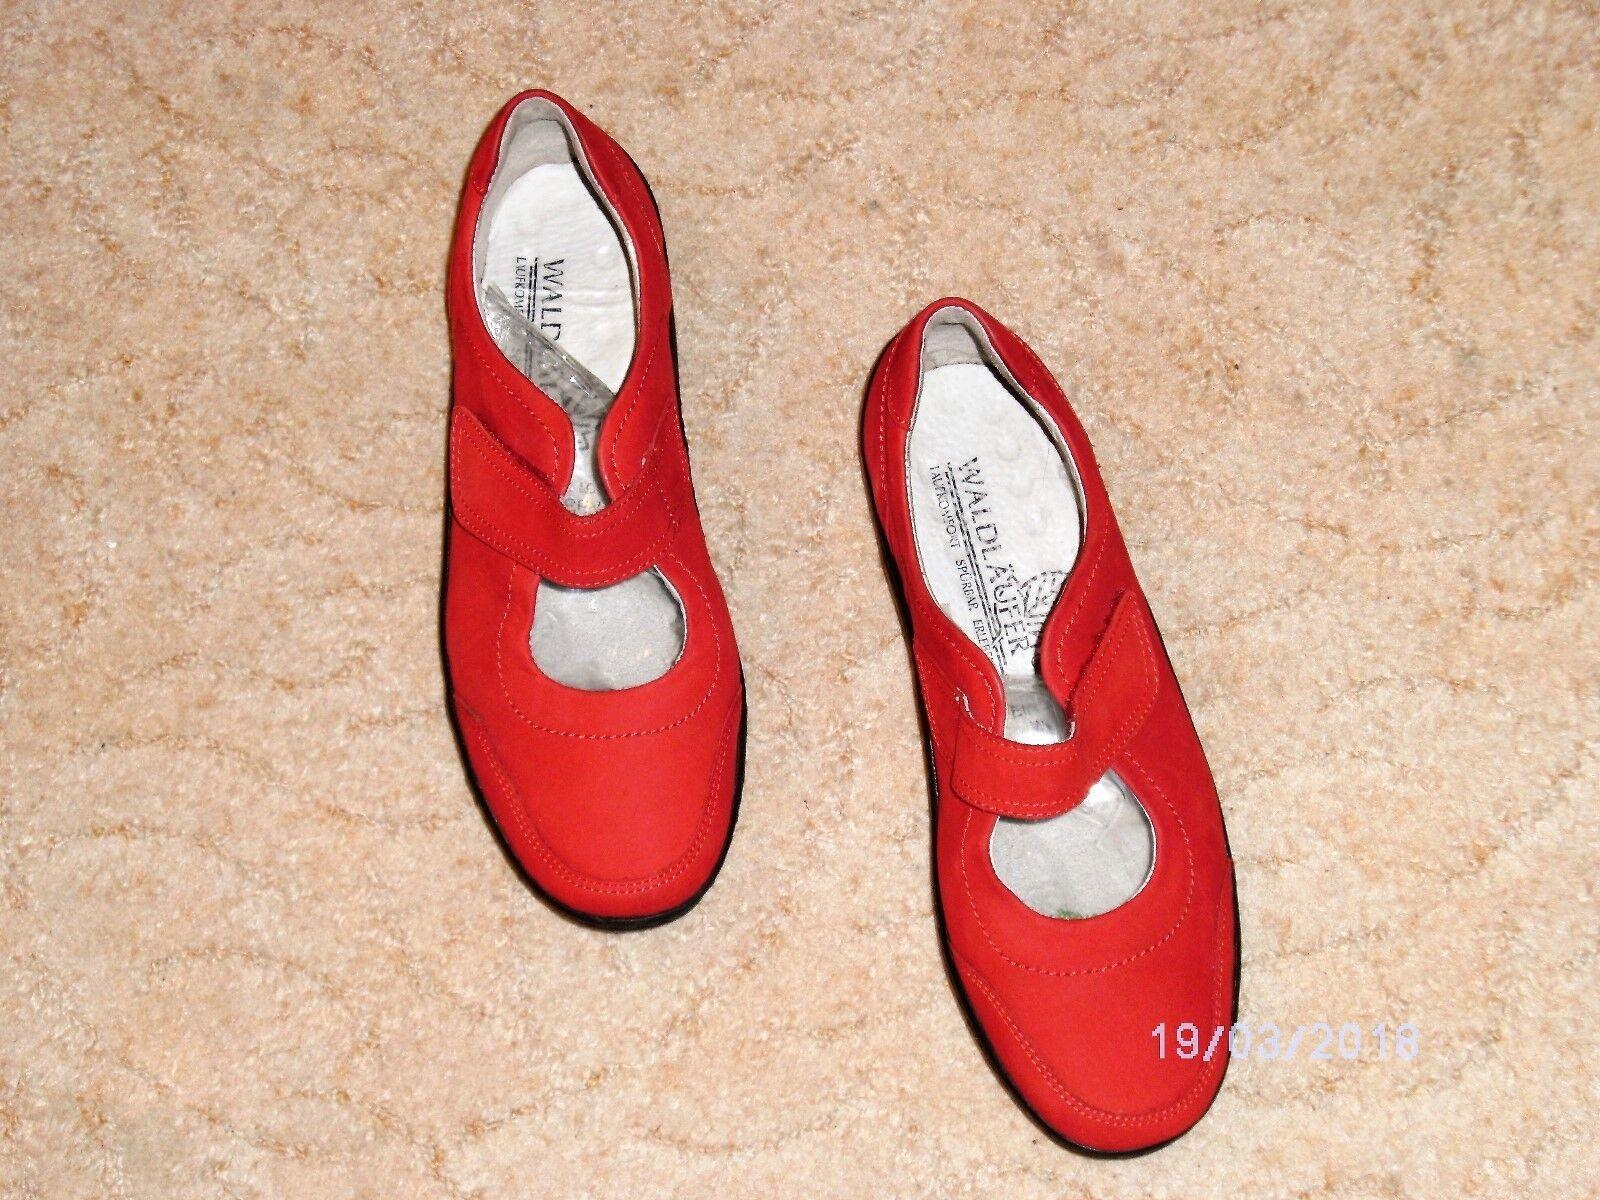 Damen Klett Leder NEU Slipper/Ballerina Waldläufer rot 37 NEU Leder aa0f12